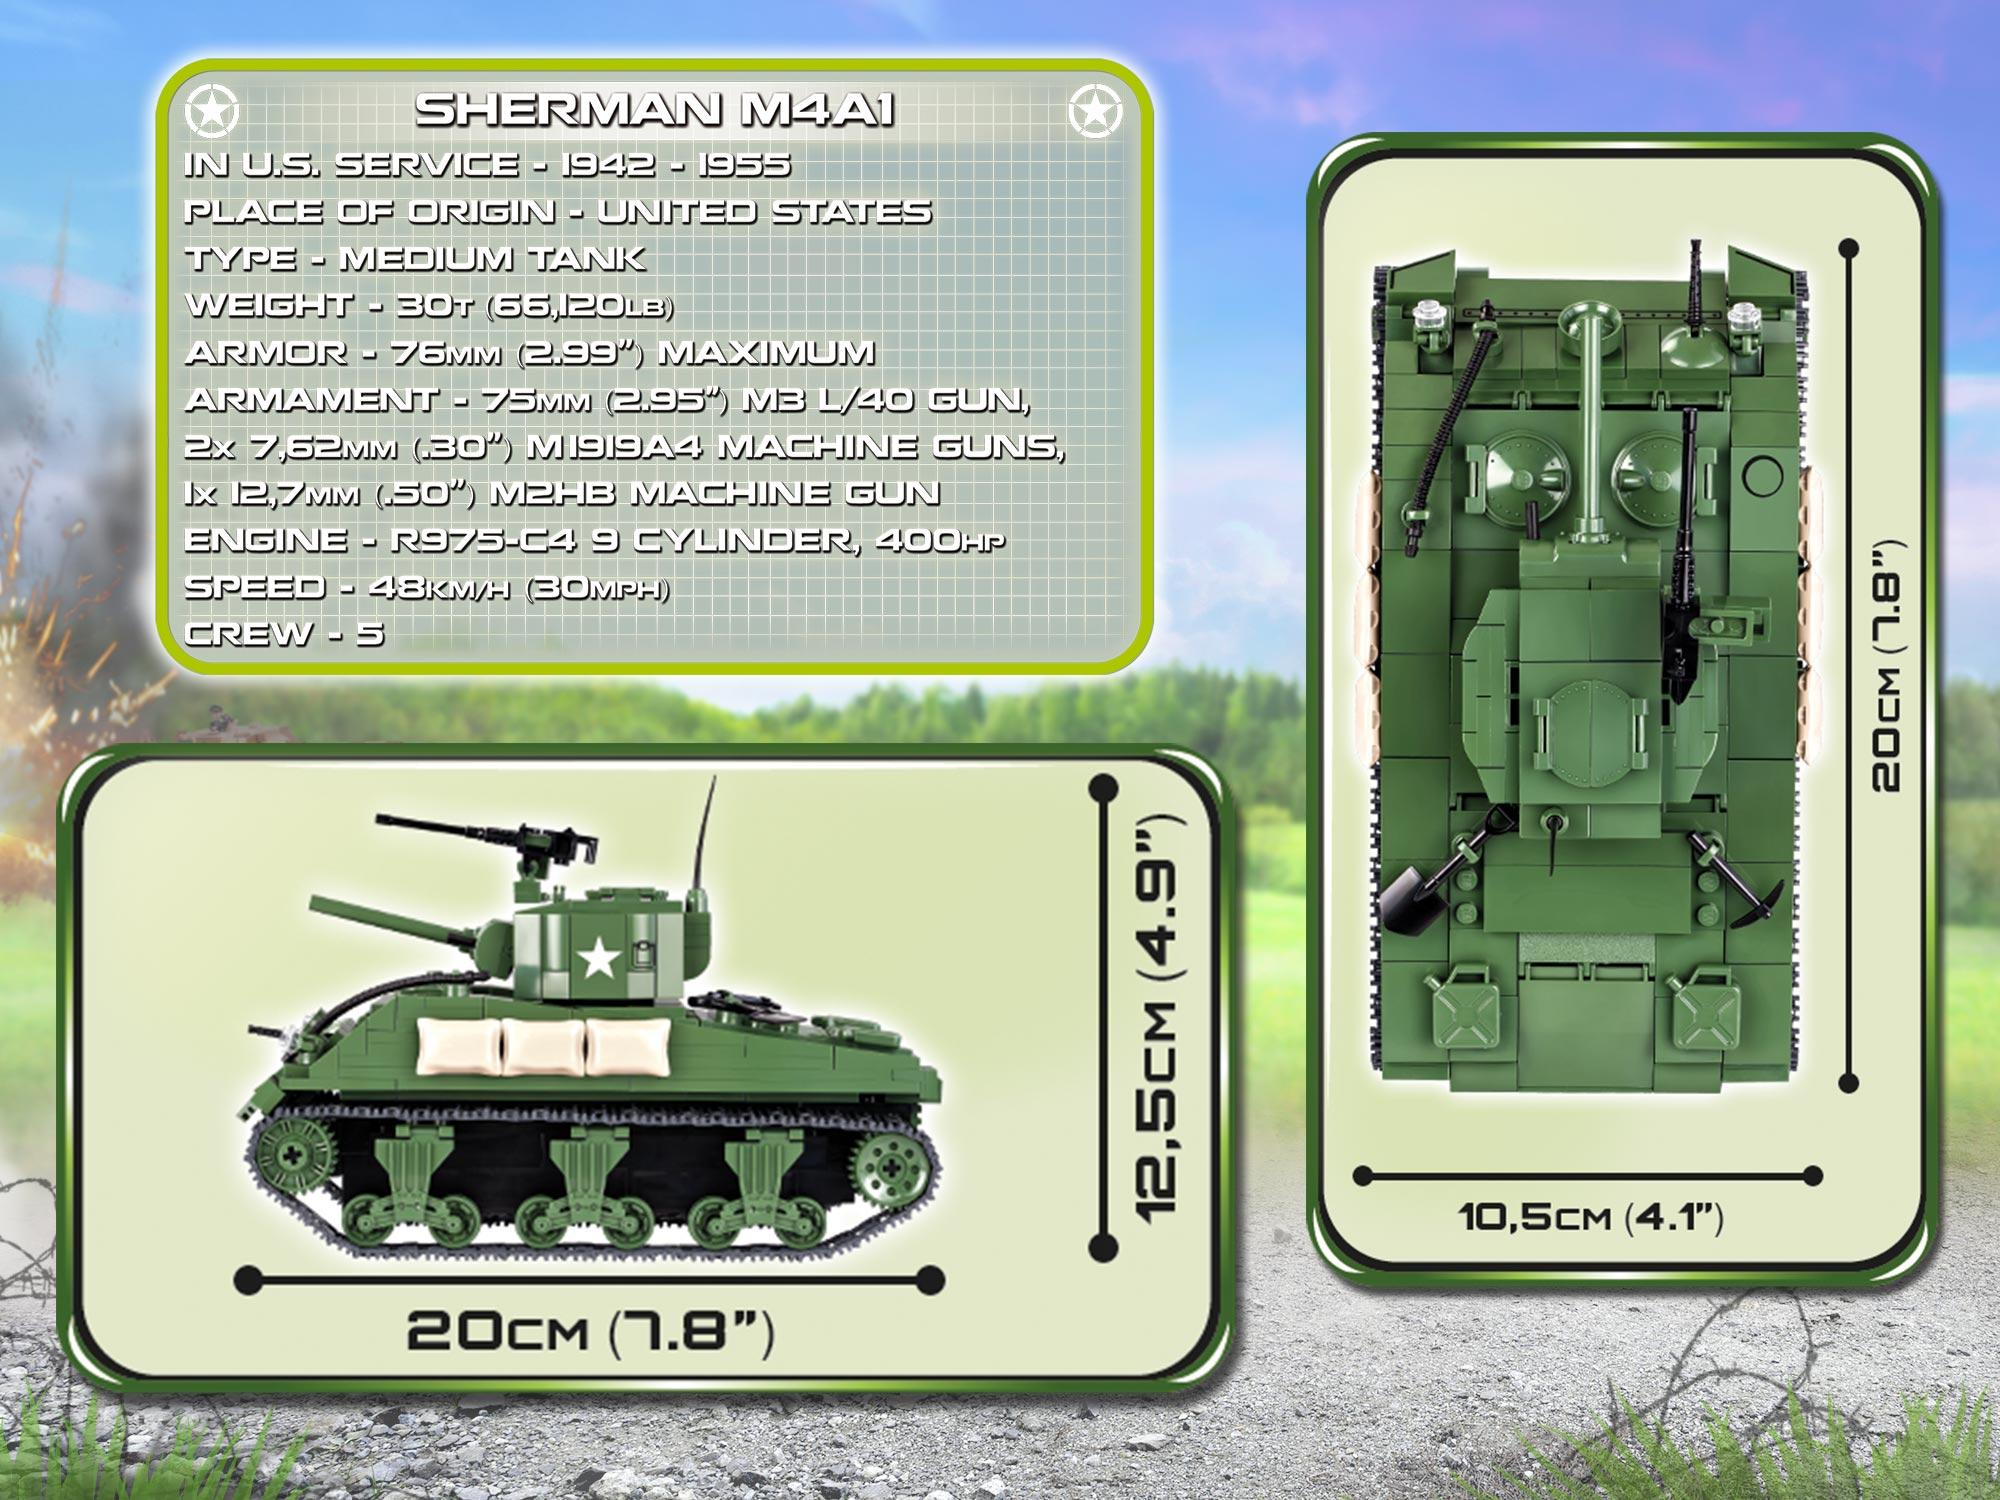 COBI Small Army WW-Sherman M4A1 Tank Building Kit - Amazon